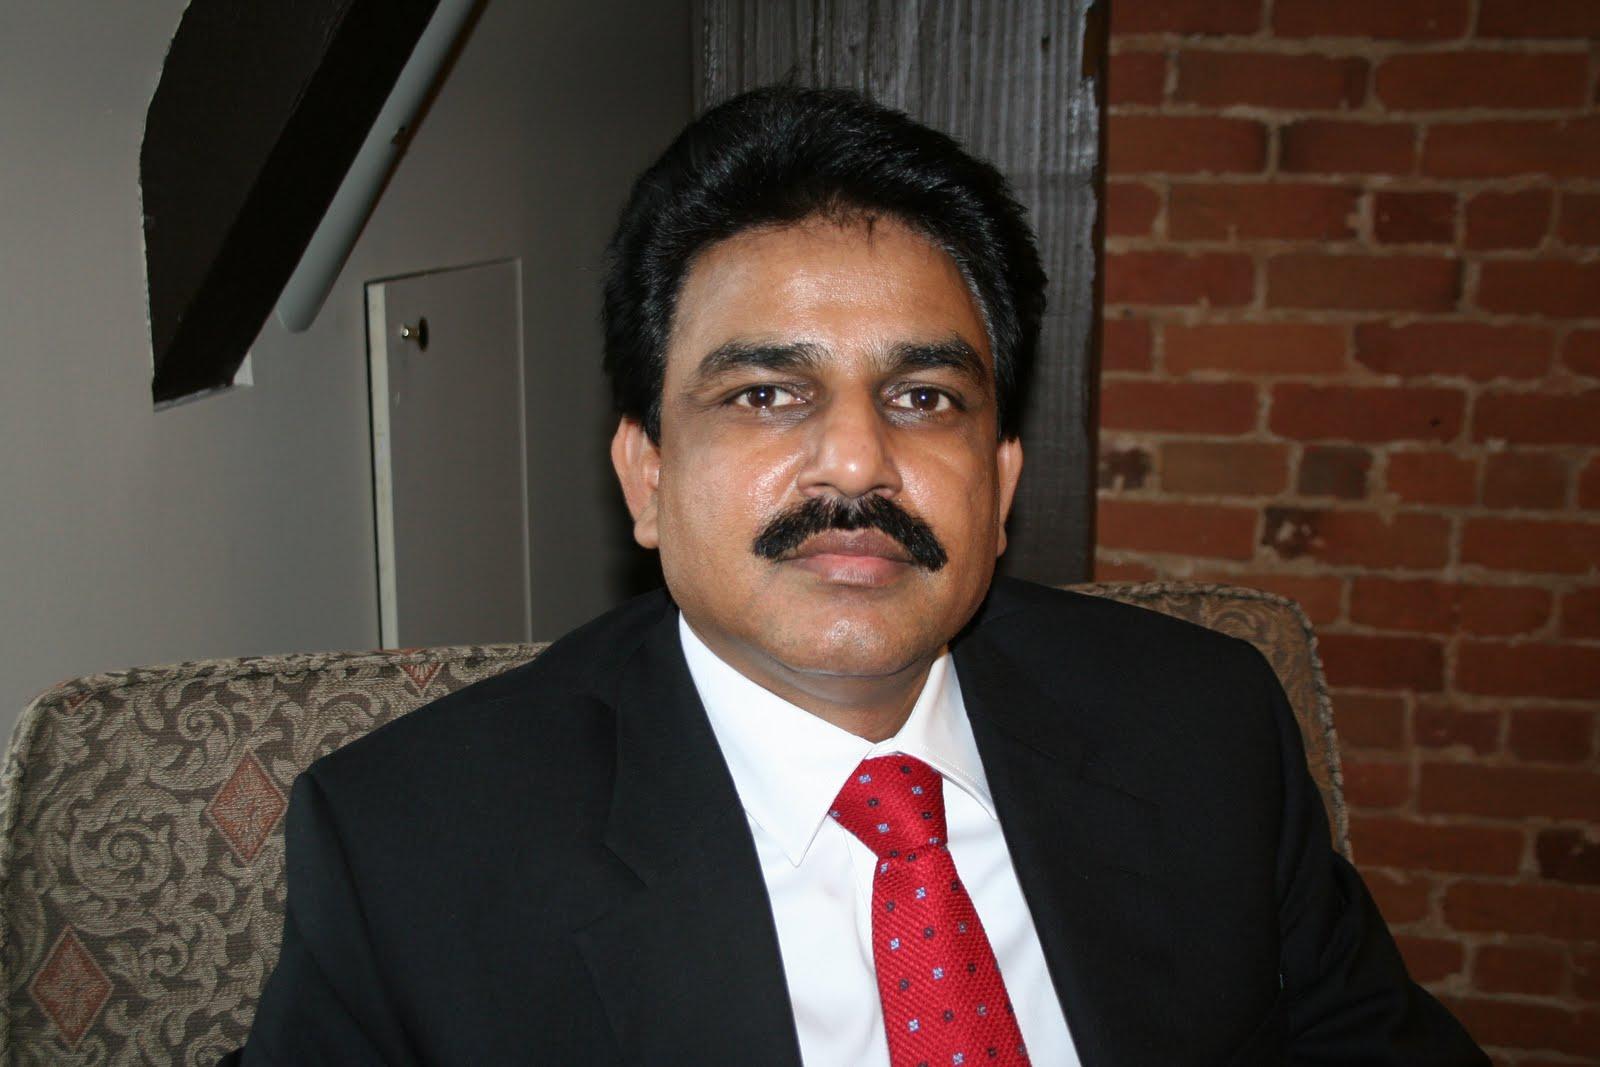 shahbaz_bhatti_pakistan